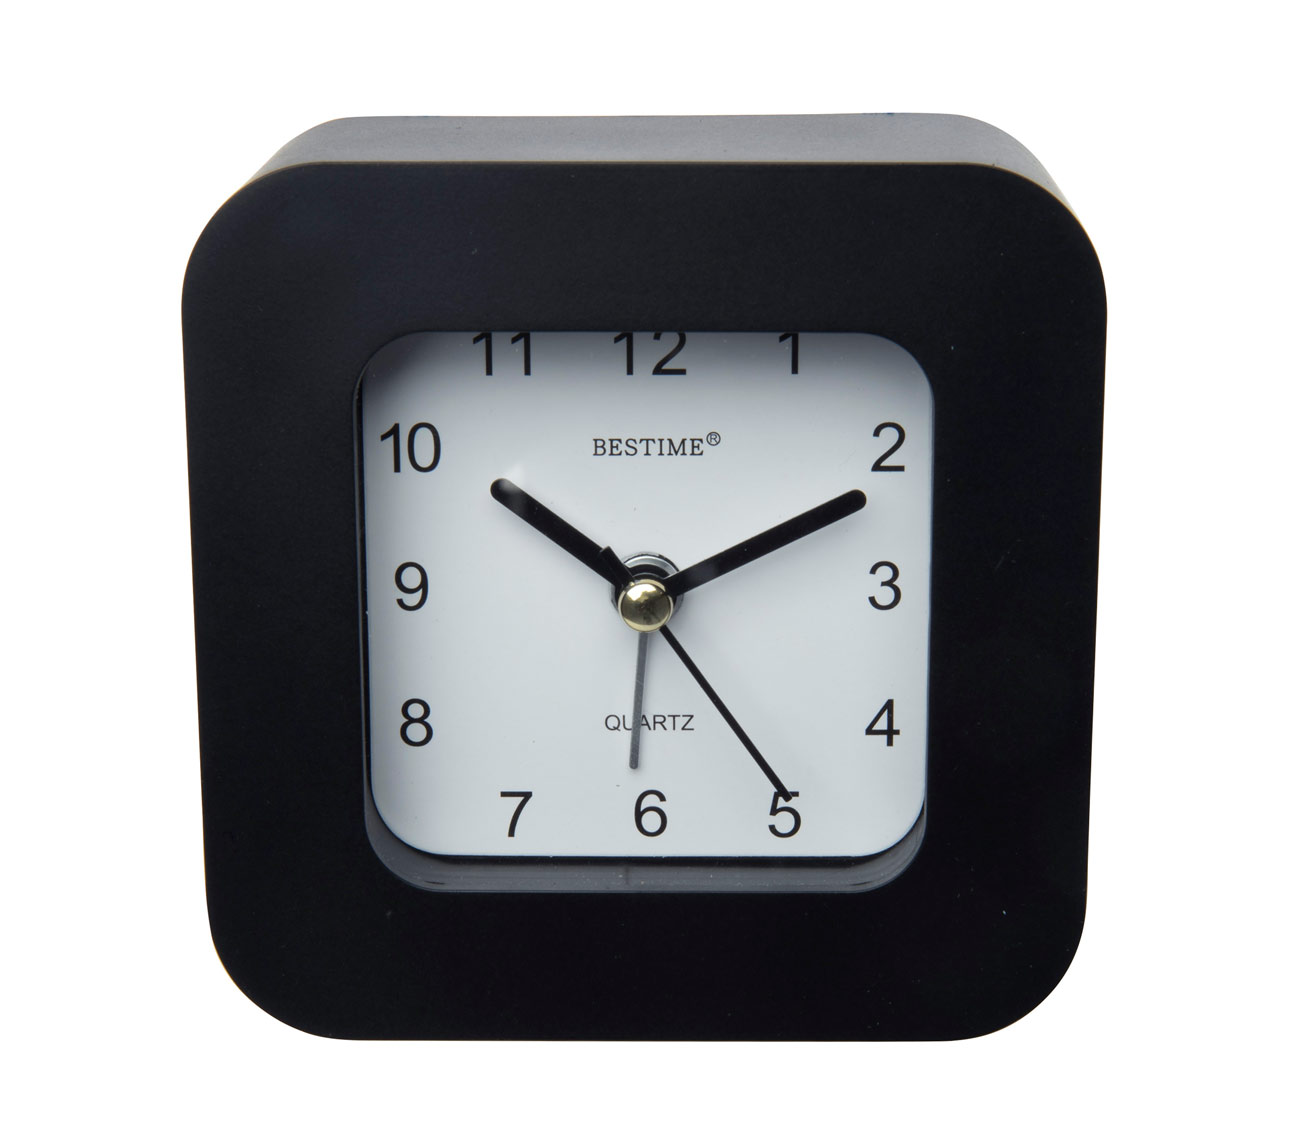 Funciona con 1 pila AA, medidas aproximadas: 10 x 10cm. Color: negro